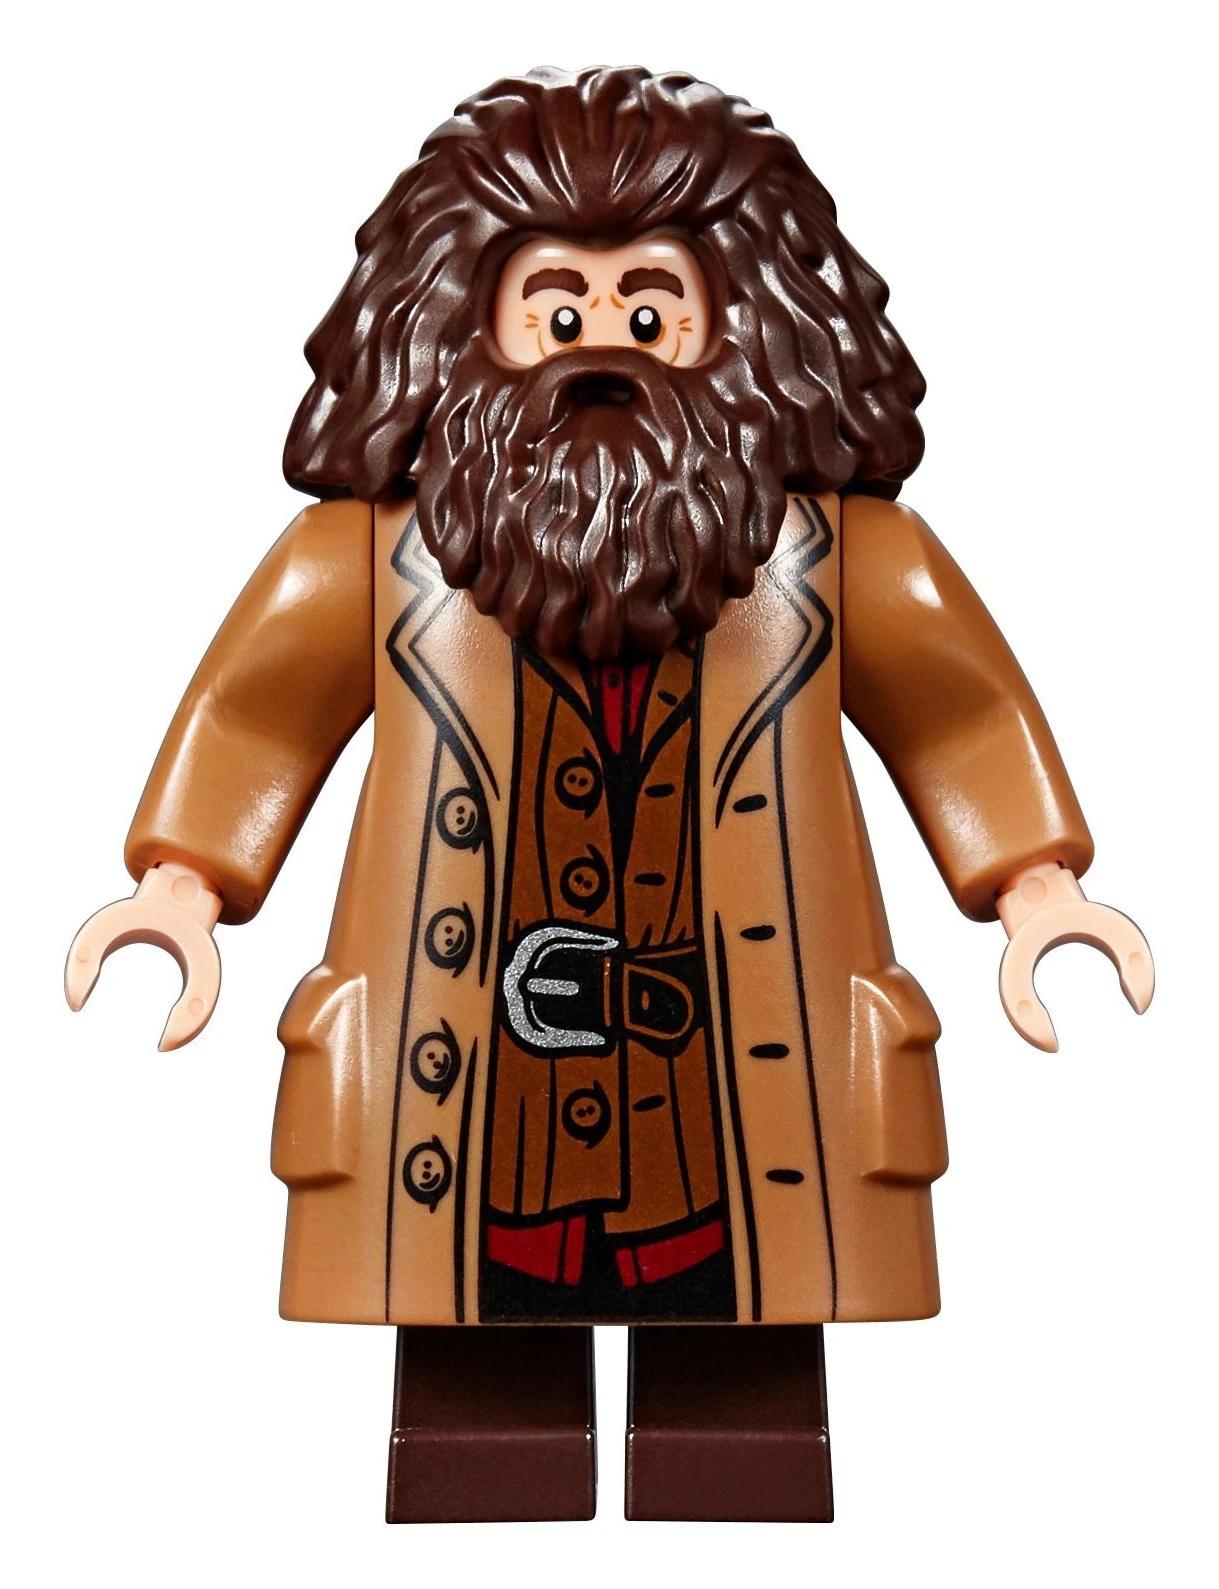 Lego Marcus Flint Head Hair piece for Harry Potter Minifigures BRAND NEW